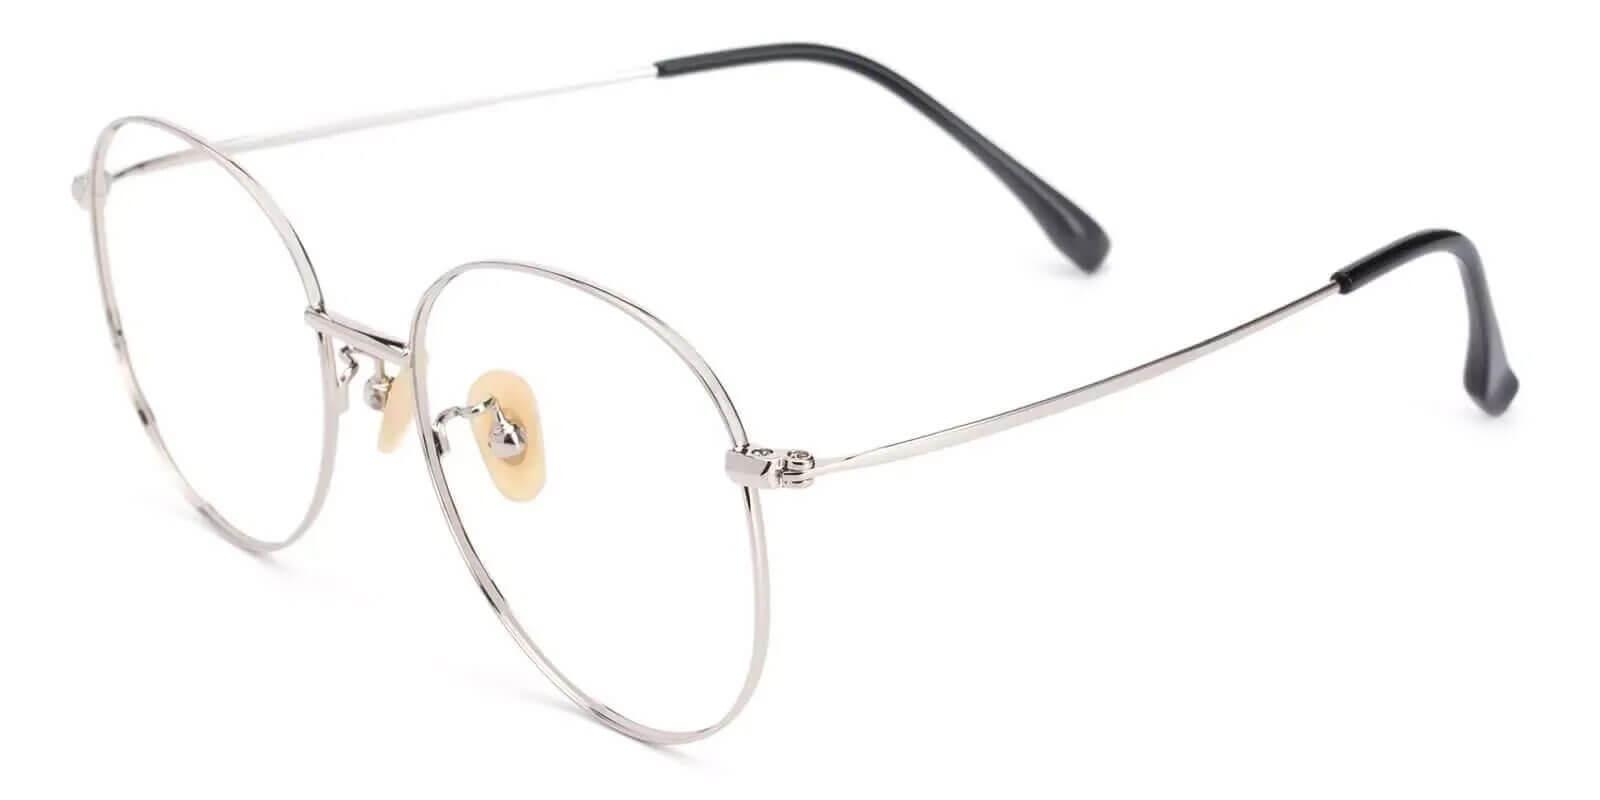 Nepal Silver Titanium Eyeglasses , Lightweight , NosePads Frames from ABBE Glasses